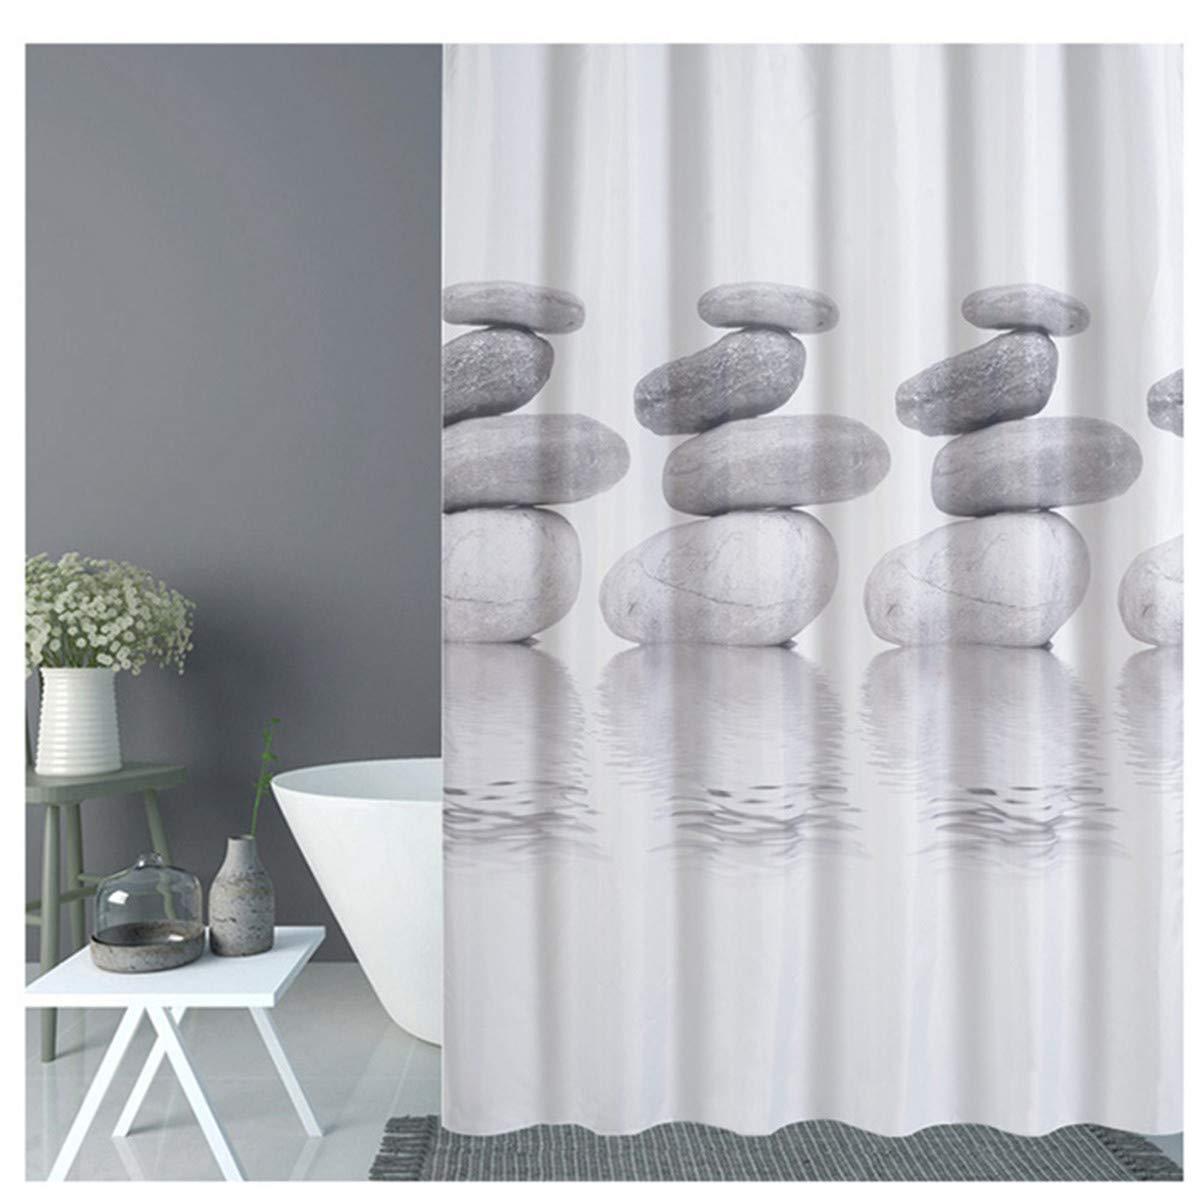 moho Resis tenter y impermeable cortina de ducha con 12/Anillas Oro Being cortina de ducha gris Pebble 120 x 180 cm